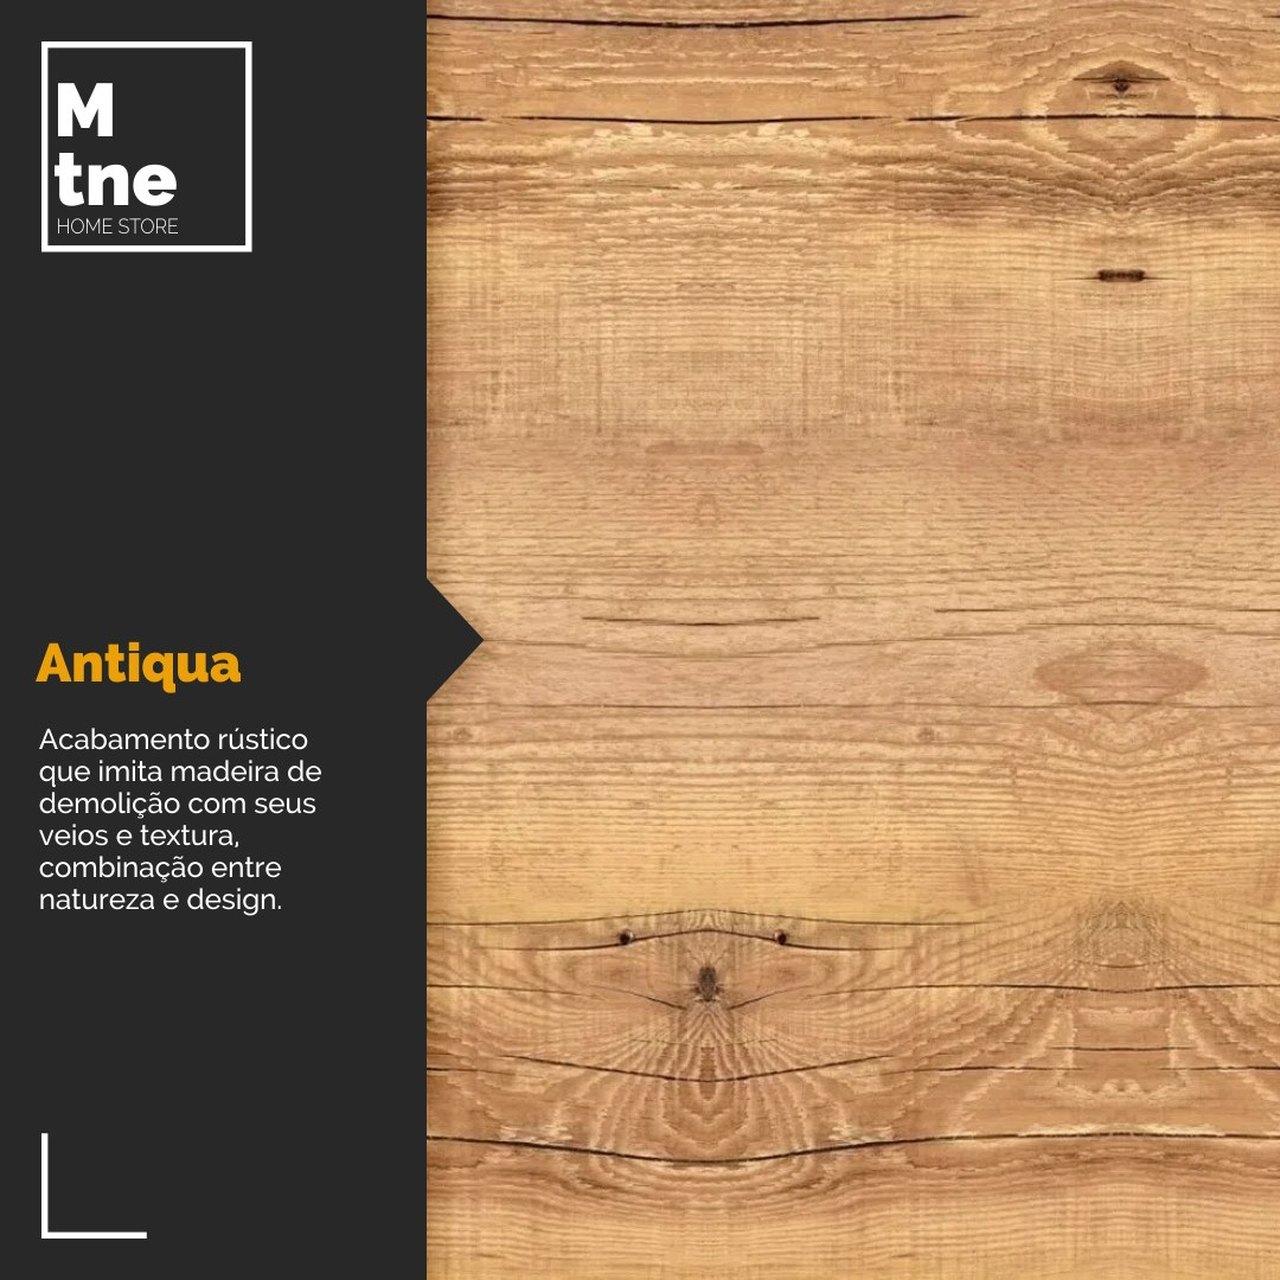 Mesa de Jantar Antiqua 90x140 Hairpin Legs com 6 Cadeiras Eames Pretas  - Mtne Store